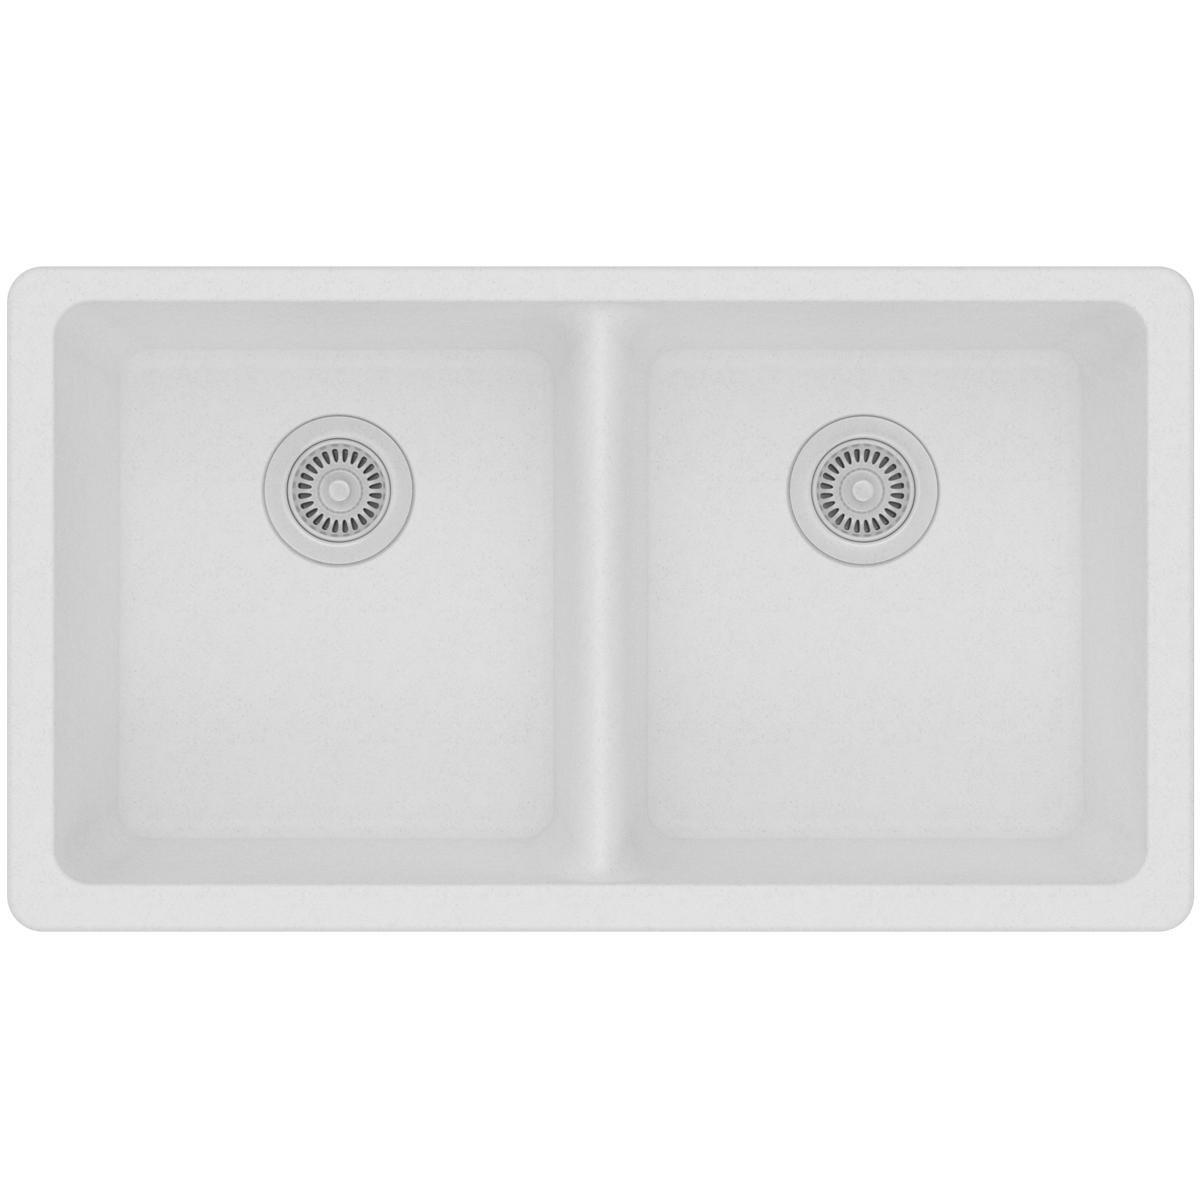 Elkay Quartz Classic ELGU3322WH0 Equal Double Bowl Undermount Sink, White